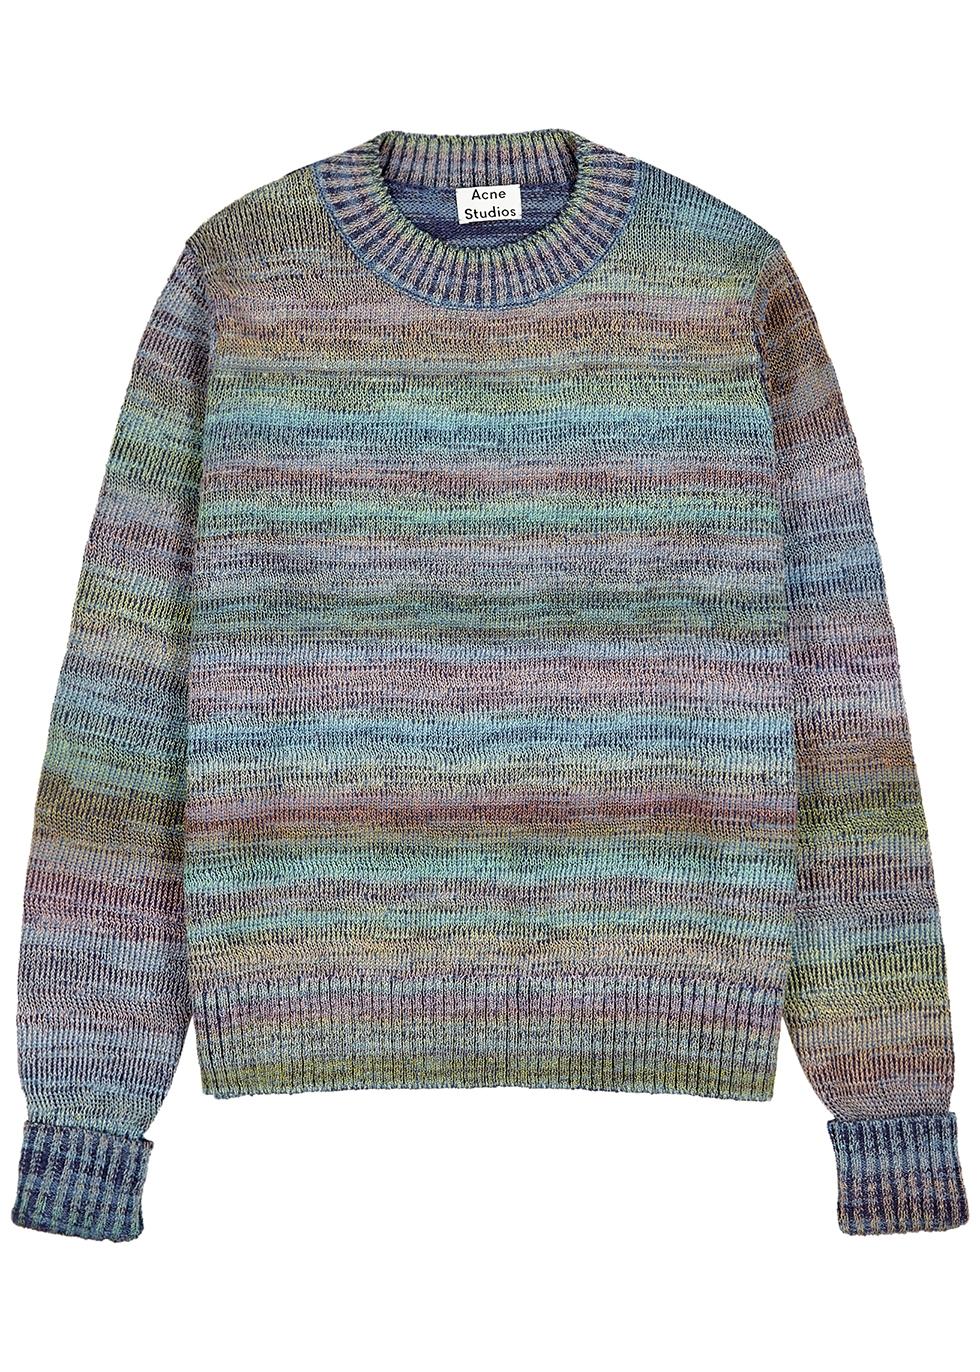 Blue striped knitted cotton-blend jumper